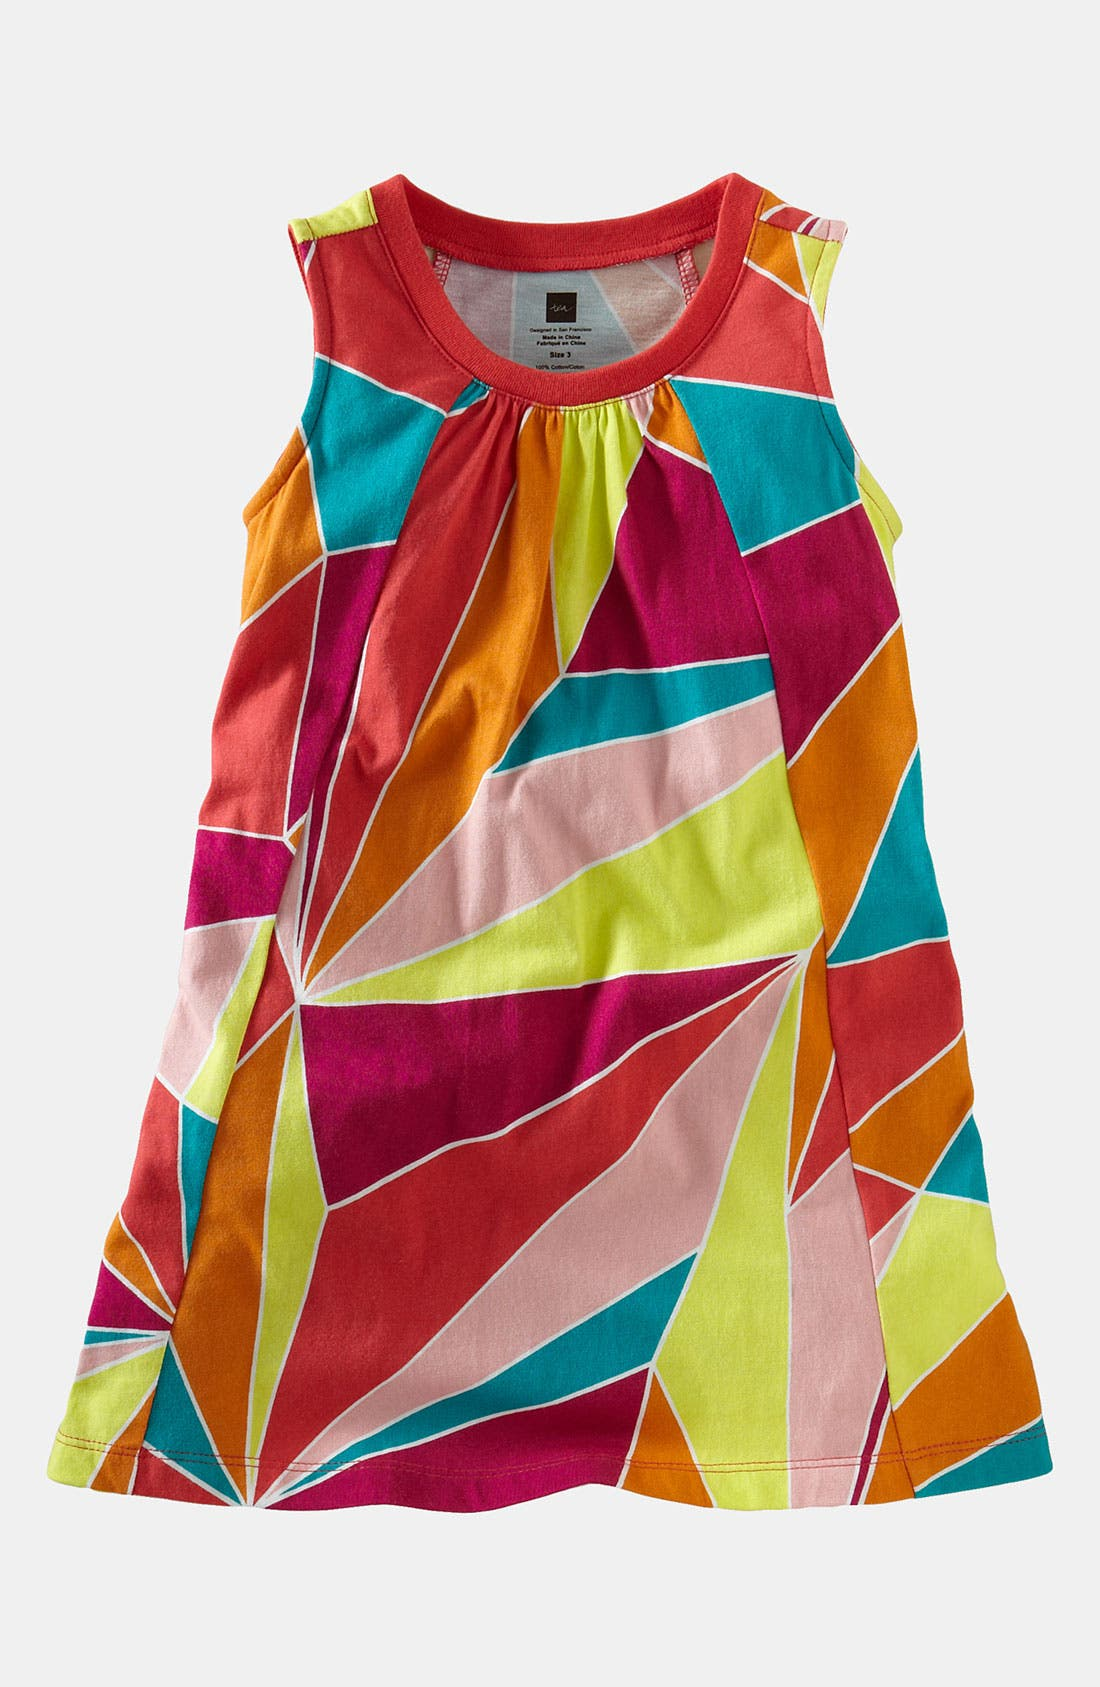 Alternate Image 1 Selected - Tea Collection 'Bo-Kaap' Dress (Baby)